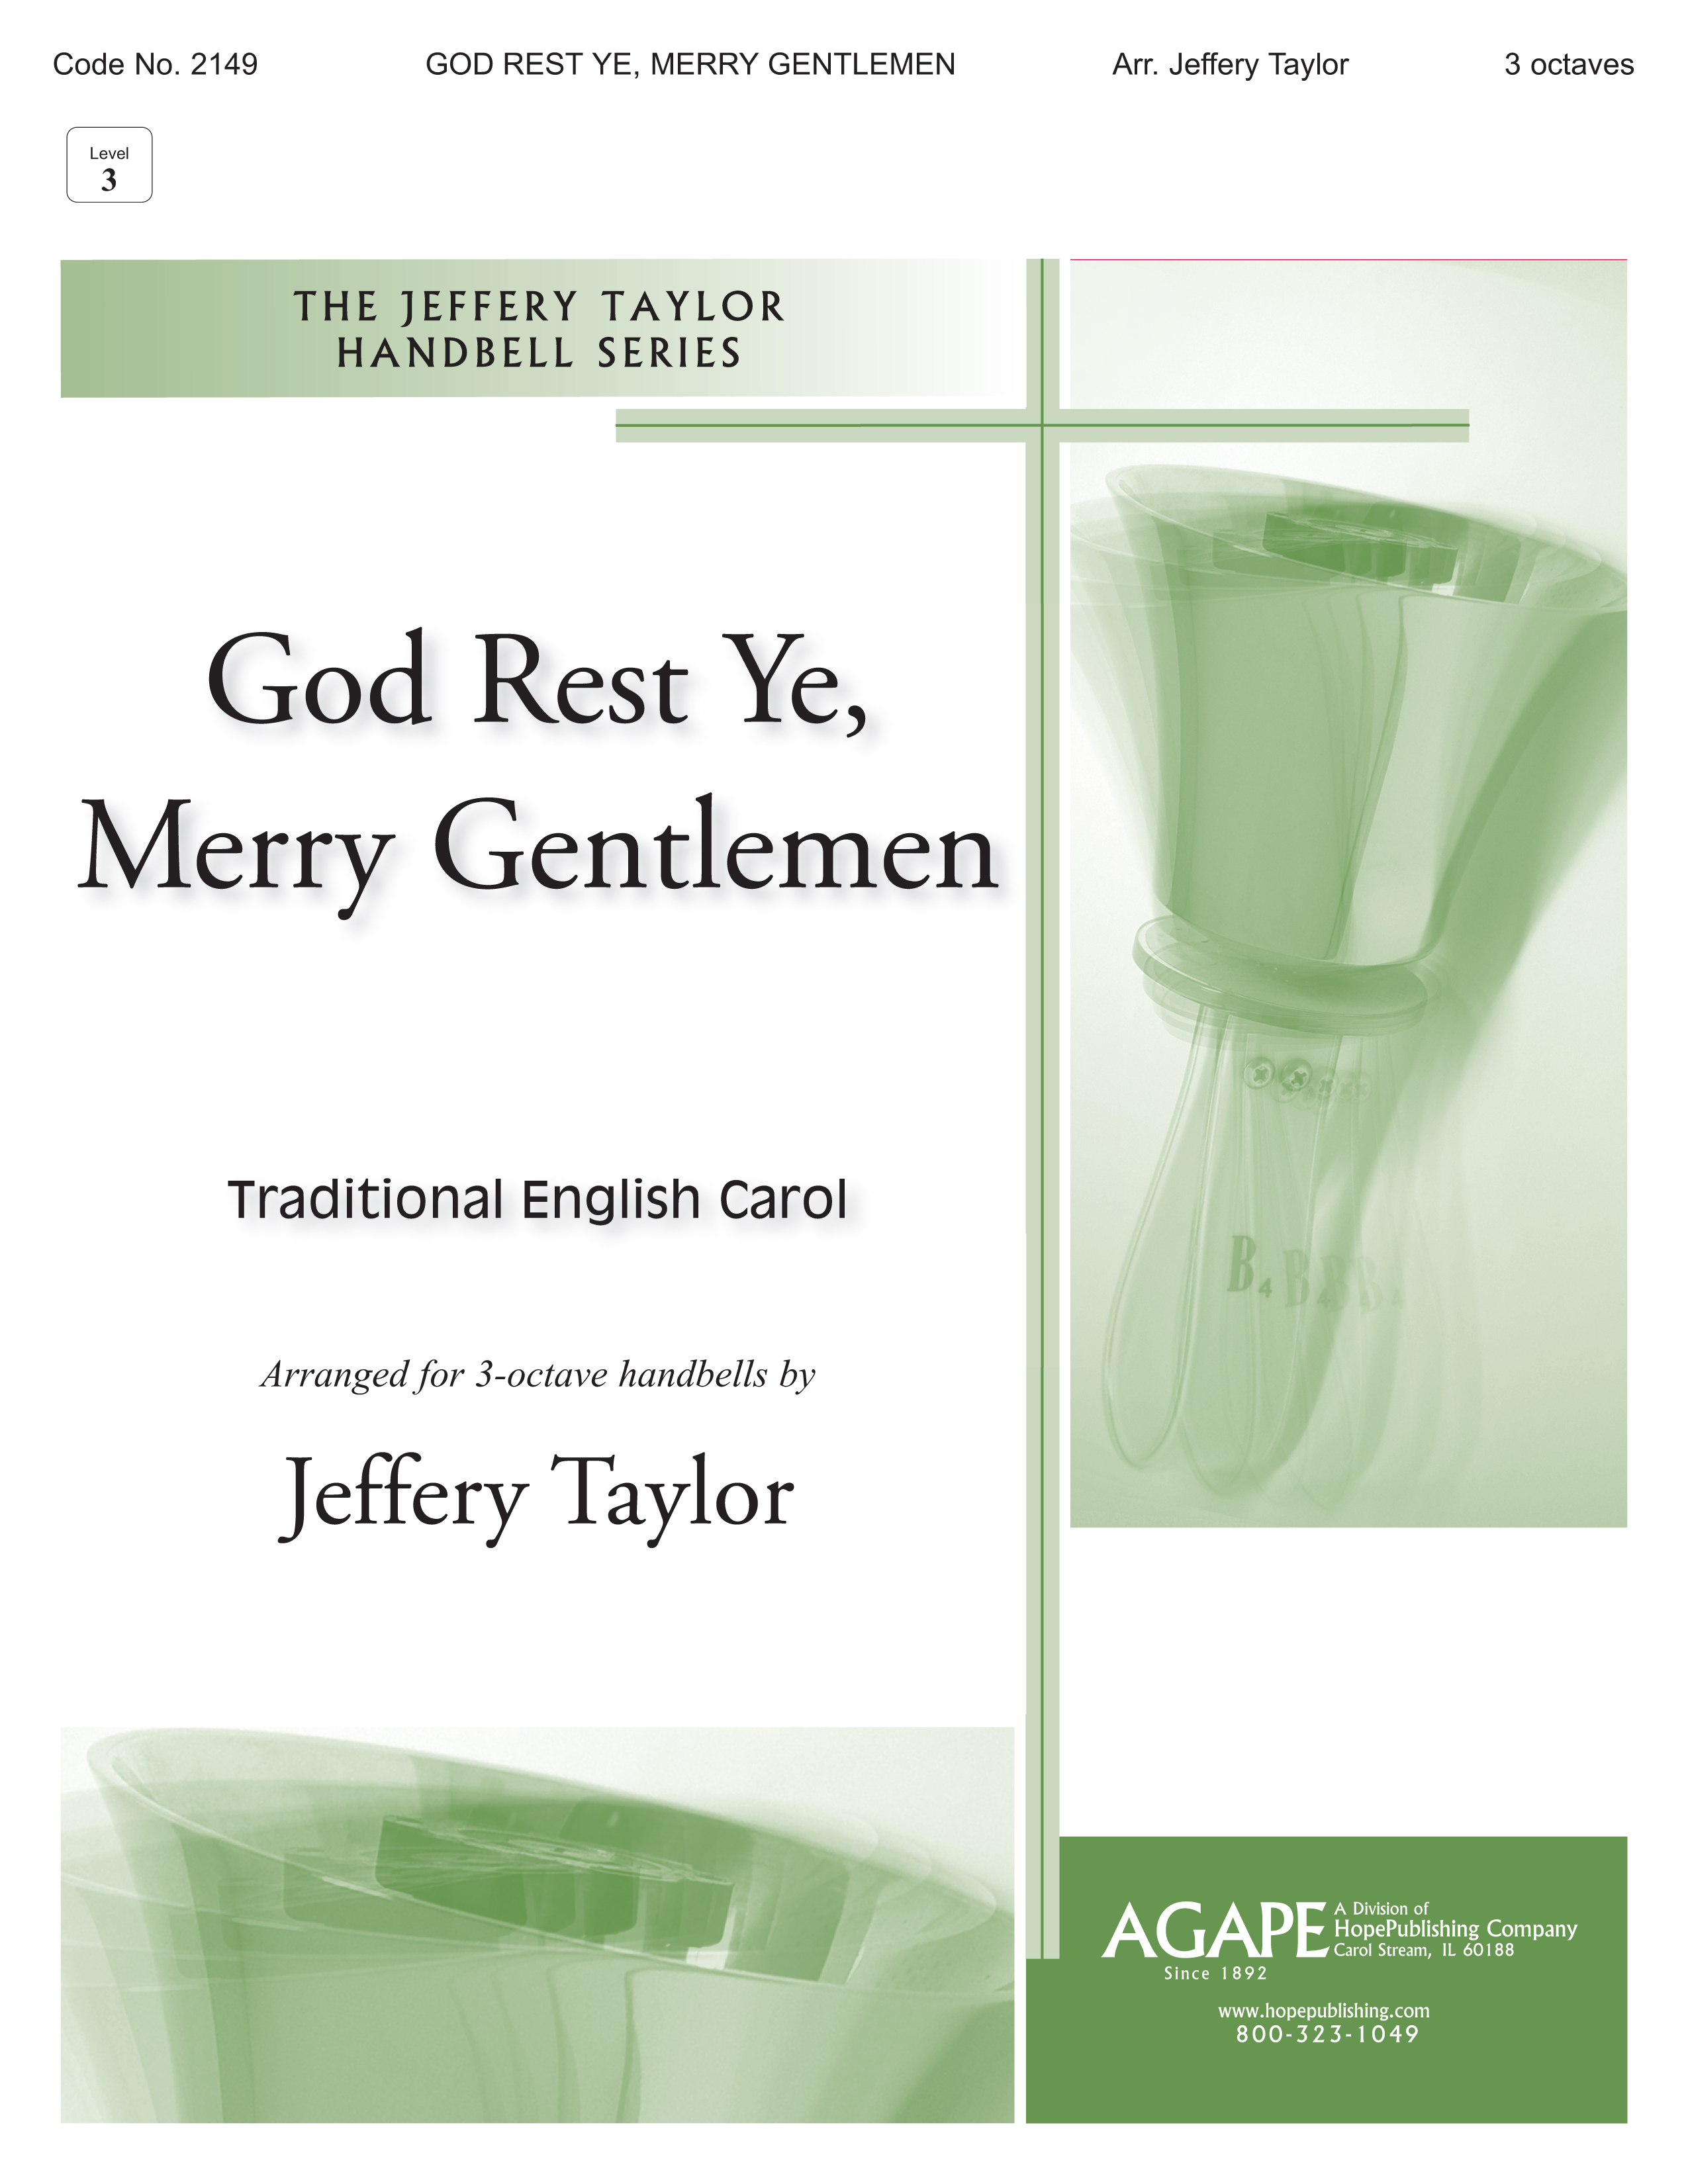 God Rest Ye Merry Gentlemen - 3 Octave Cover Image